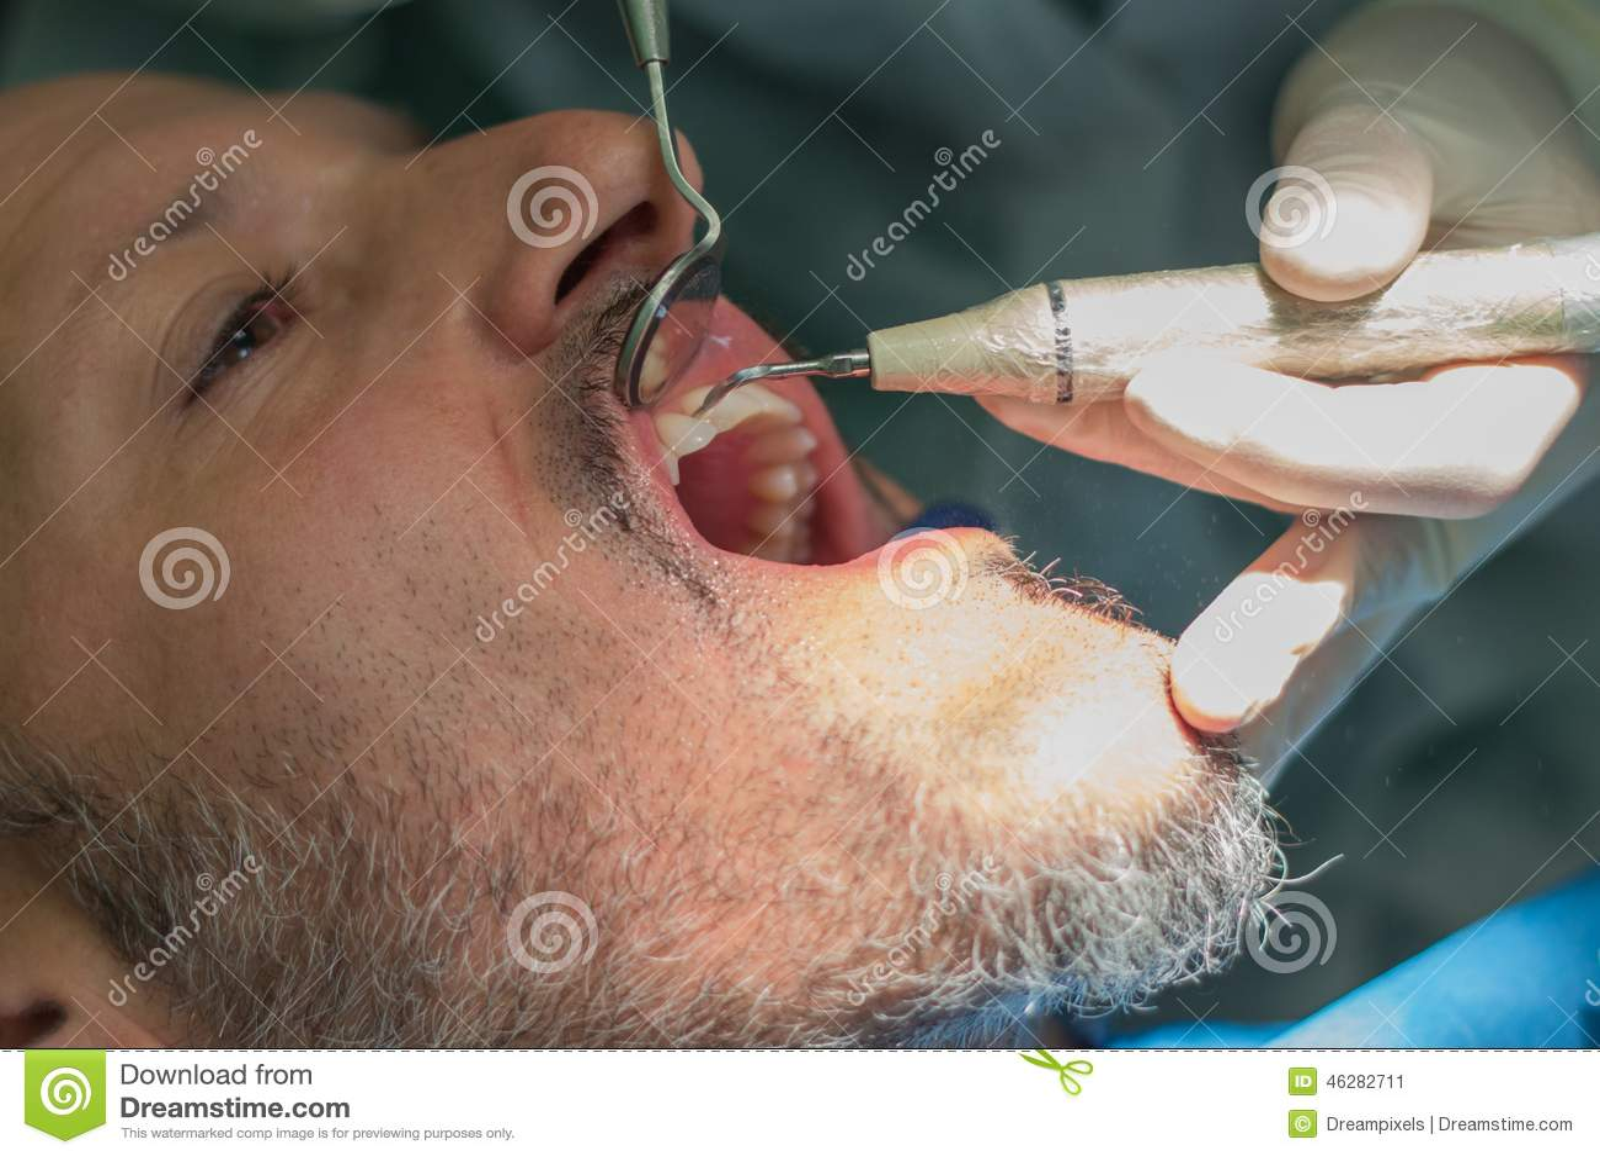 Середина постарела человек на зубоврачебной клинике checke дантиста его зубы